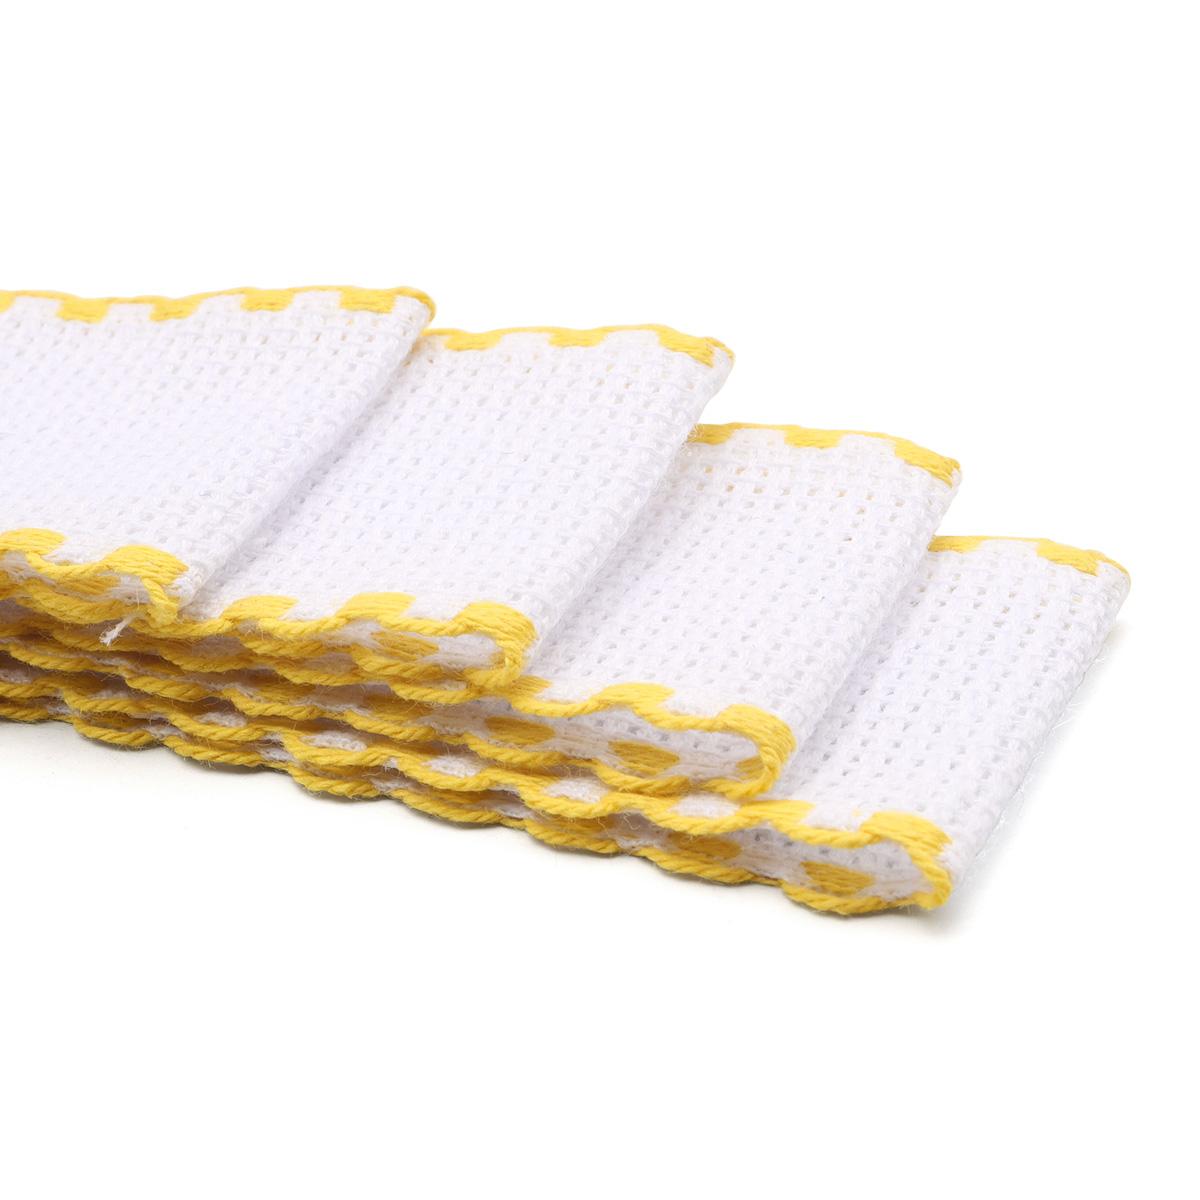 Канва 'лента', 1,5м*3,5см, 100% хлопок Bestex (белый/желтый) фото